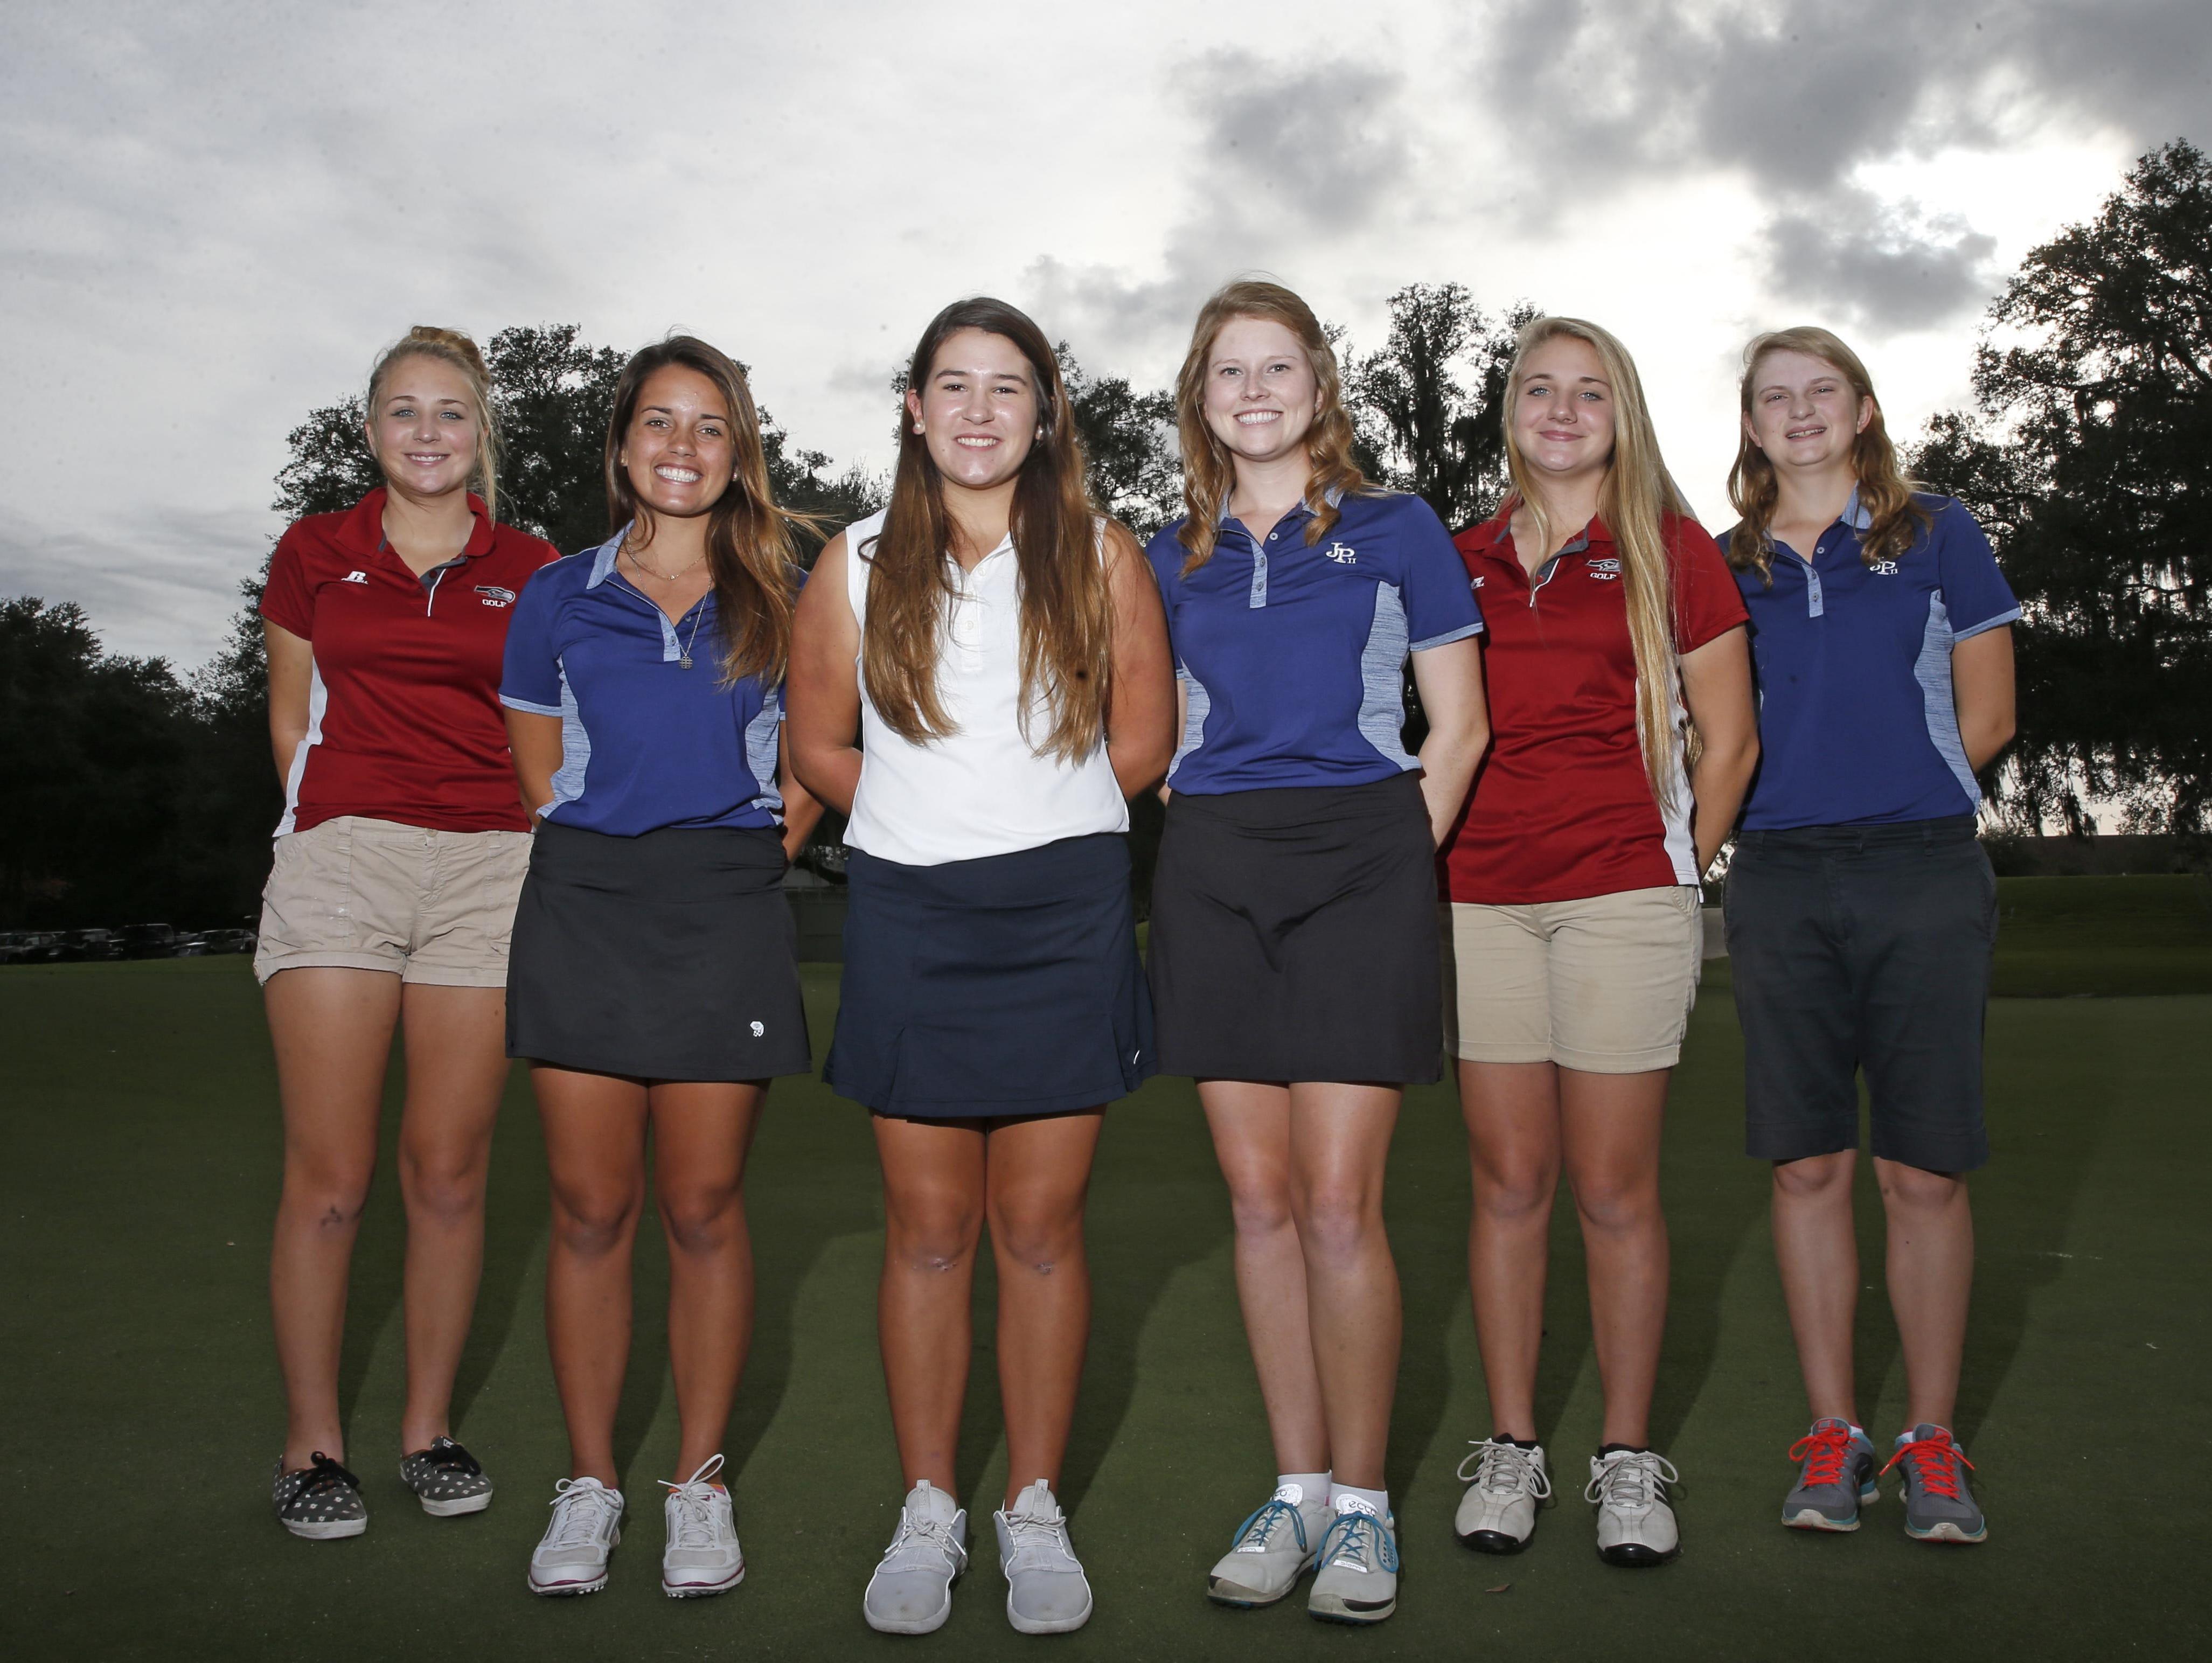 The 2015 All-Big Bend girls golf first team. From left: Megan Collins (Franklin County), Grace Murray (John Paul II), Megan Schofill (Aucilla Christian), Player of the Year Teresa Conroy (John Paul II), Melanie Collins (Franklin County), Morgan Comer (John Paul II)